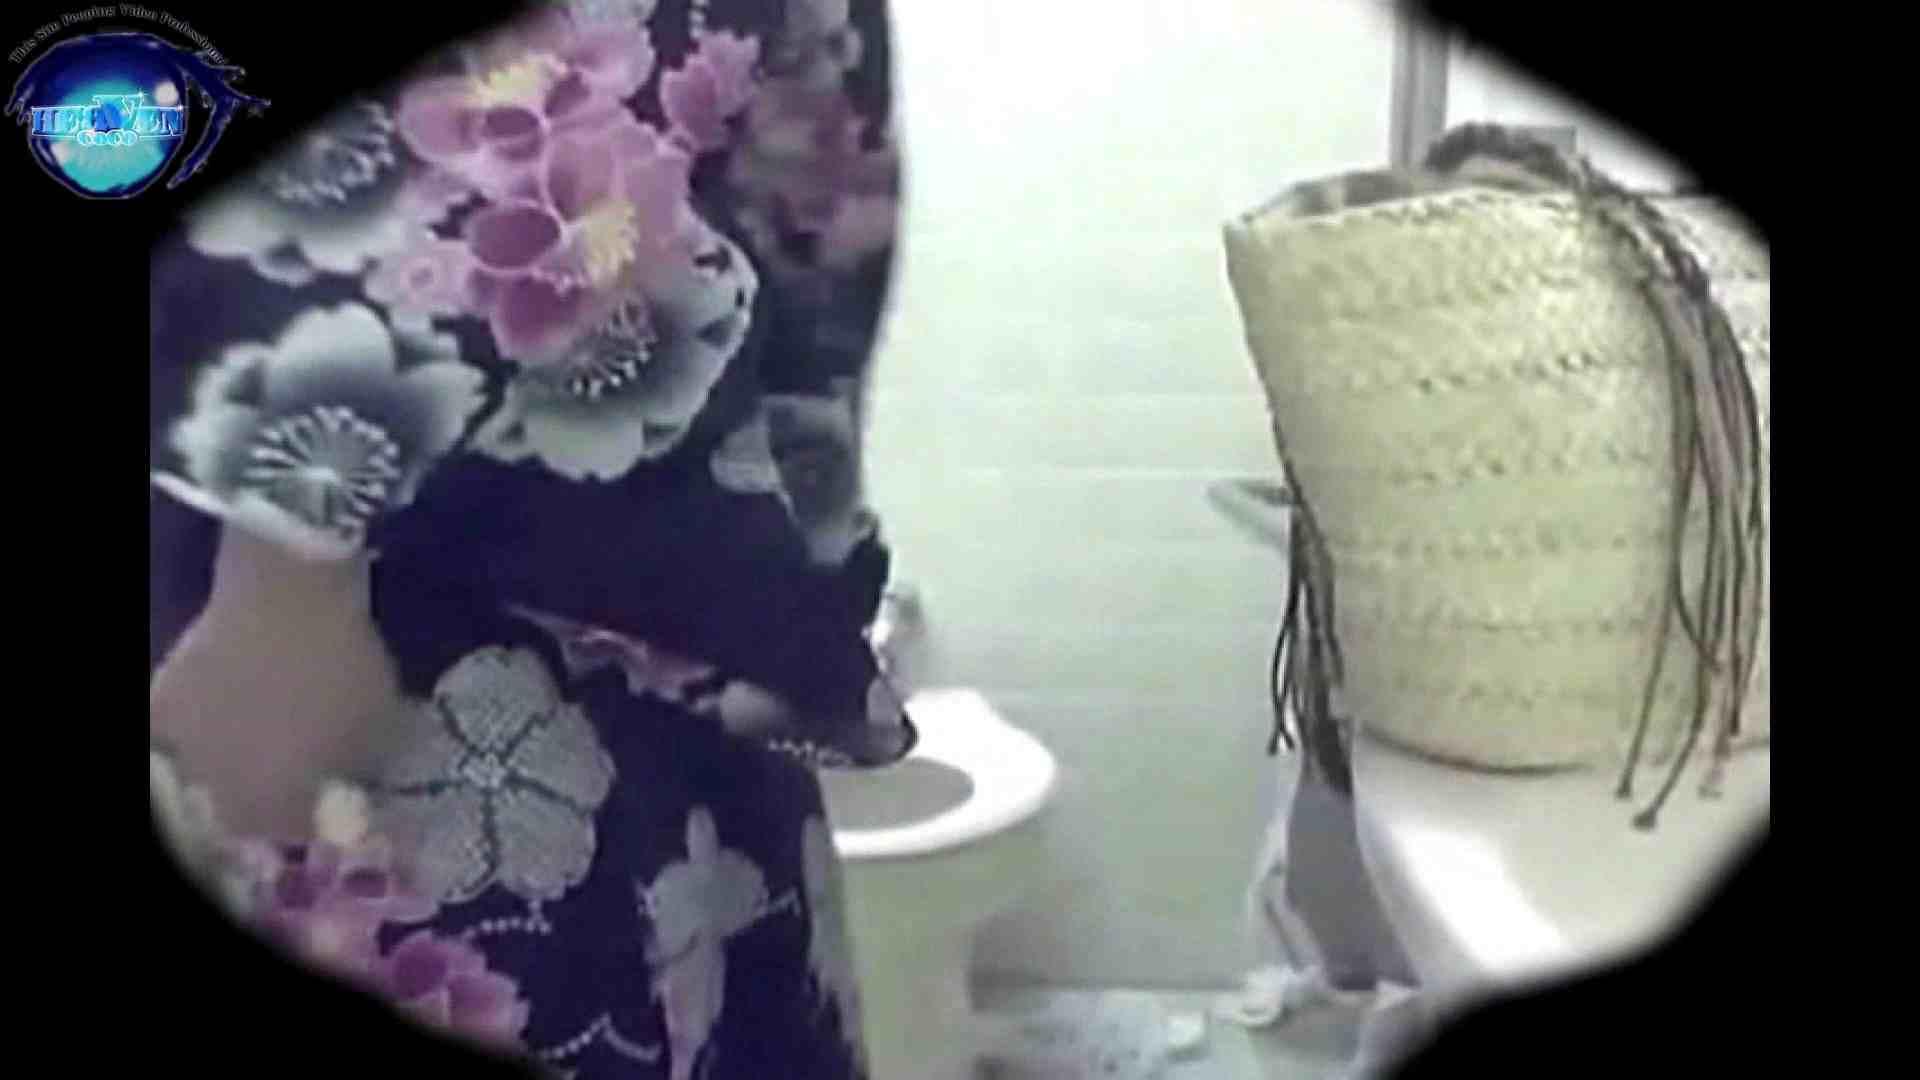 teen galトイレ覗き紙がナイ編‼vol.17 トイレ流出 | 覗き  93連発 49